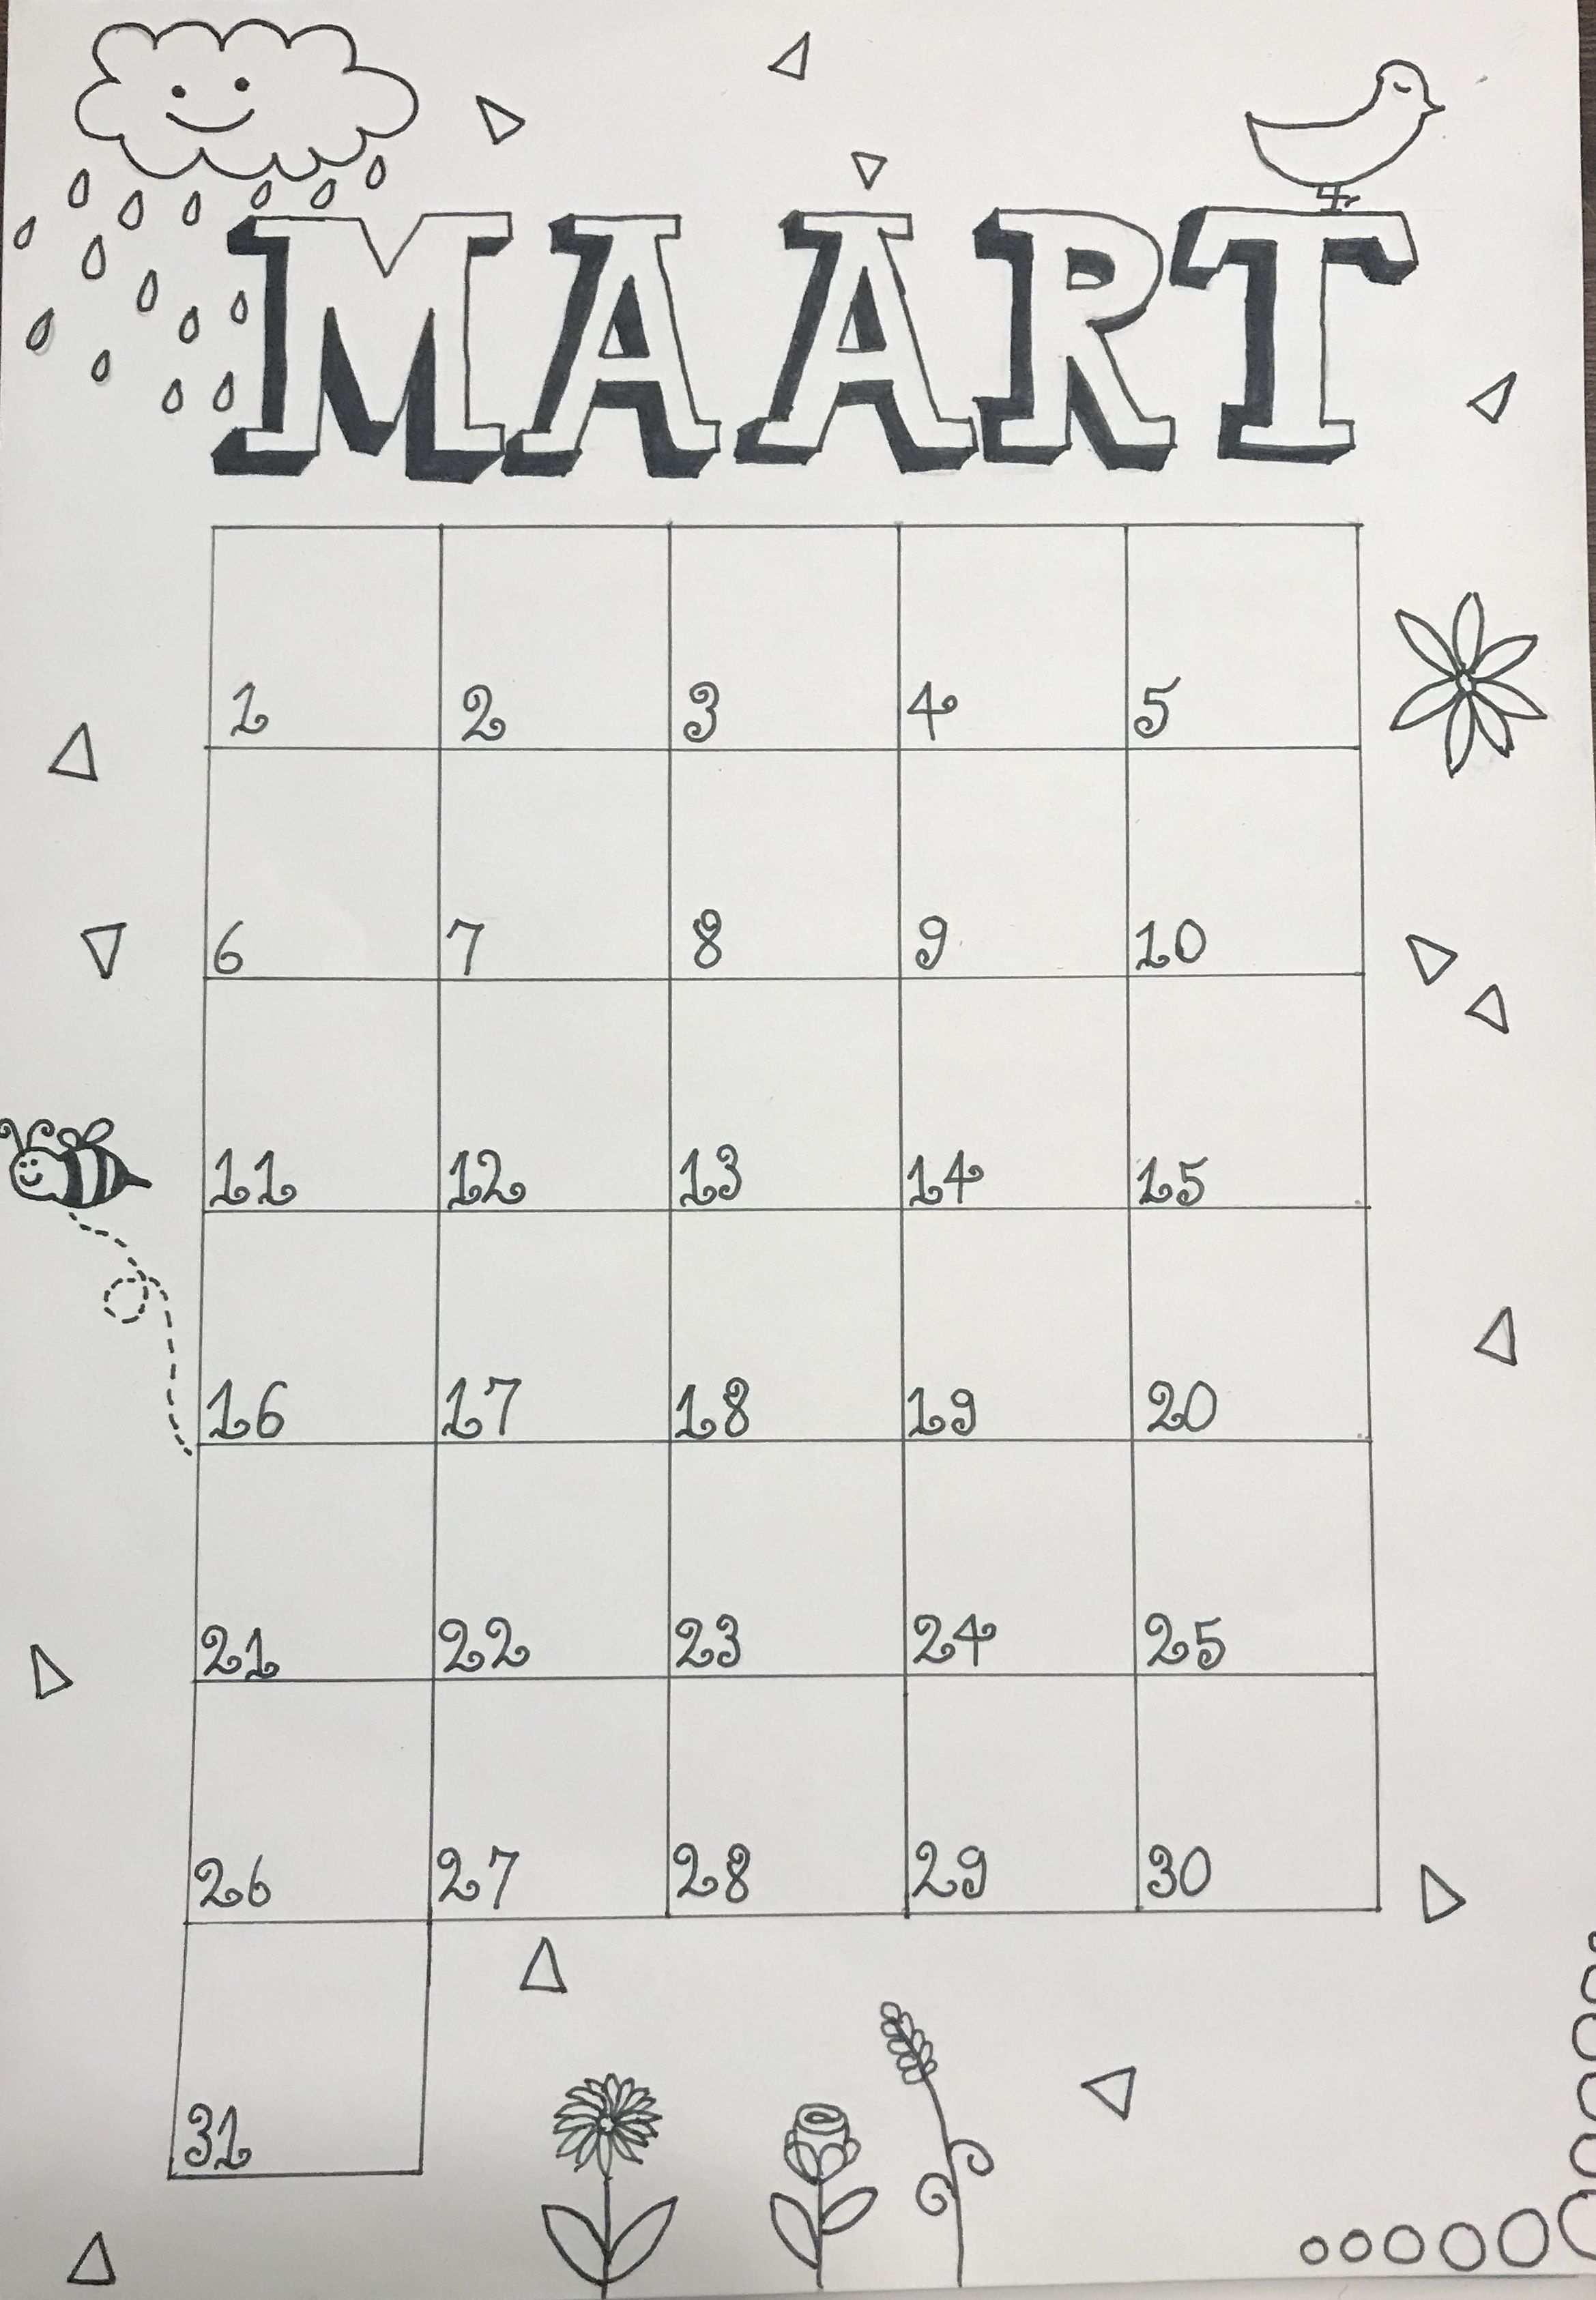 Kalender Maart Handlettering Maart Kalender Calendar Birthdaycalendar Kalender Ideeen Kalender Bullet Journal Ideeen